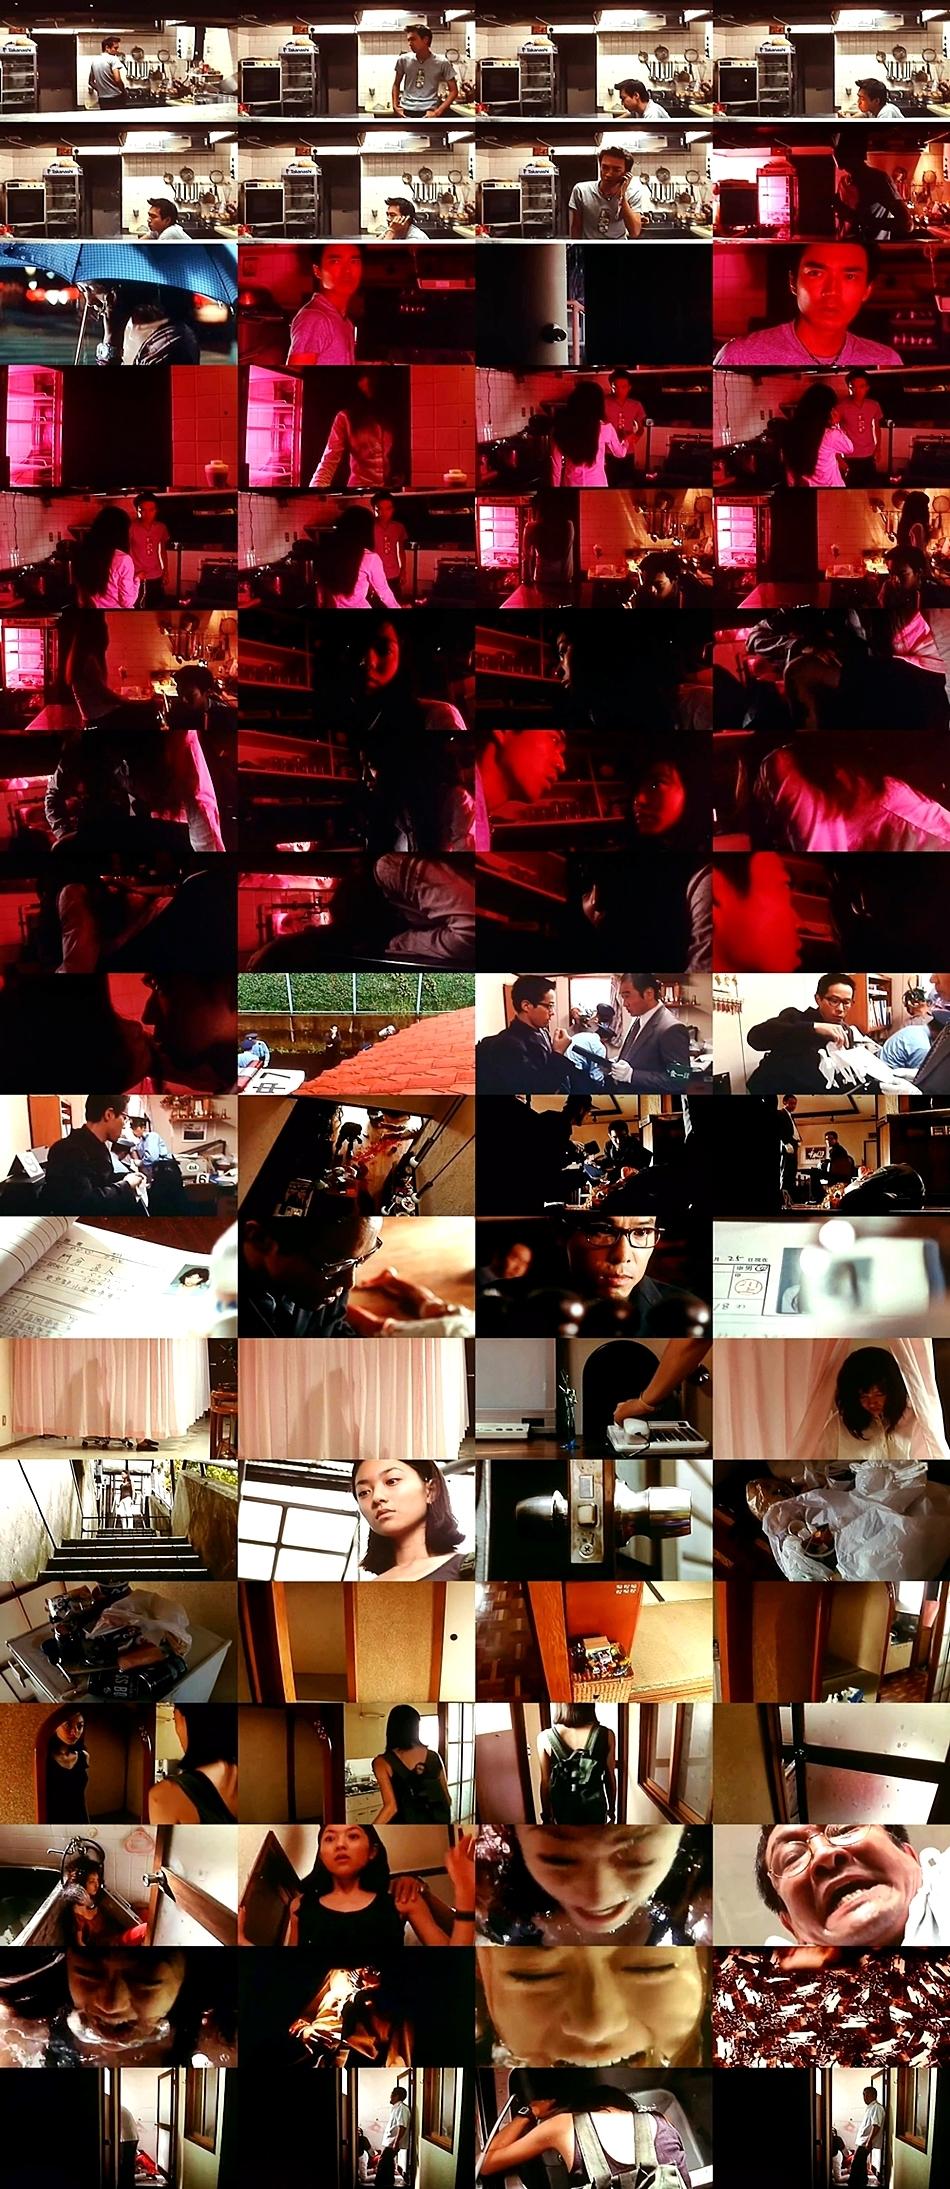 富江 tomie (1998)